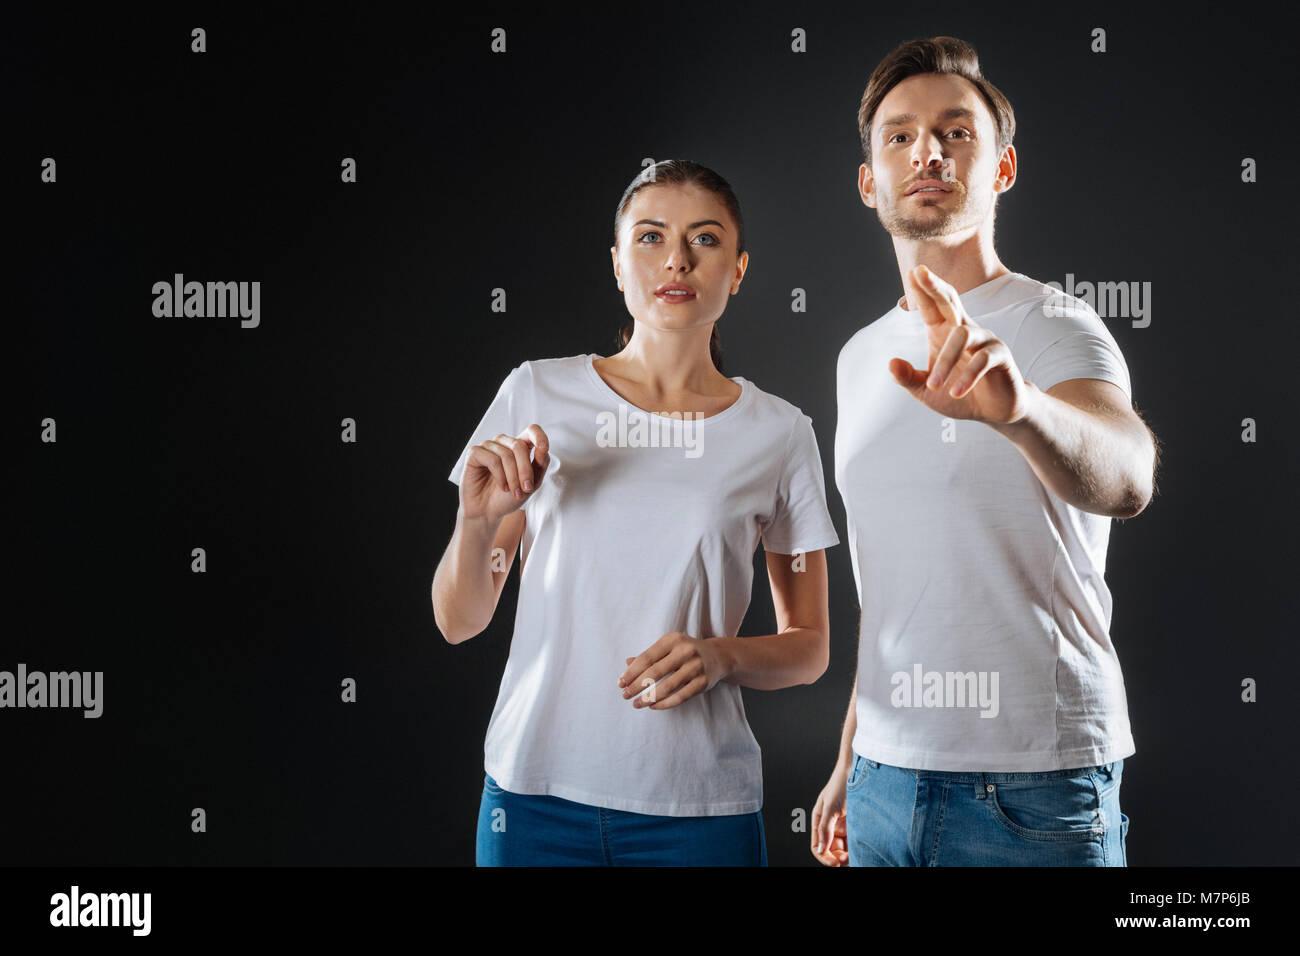 Creative pleasant couple imagining and communicating. - Stock Image